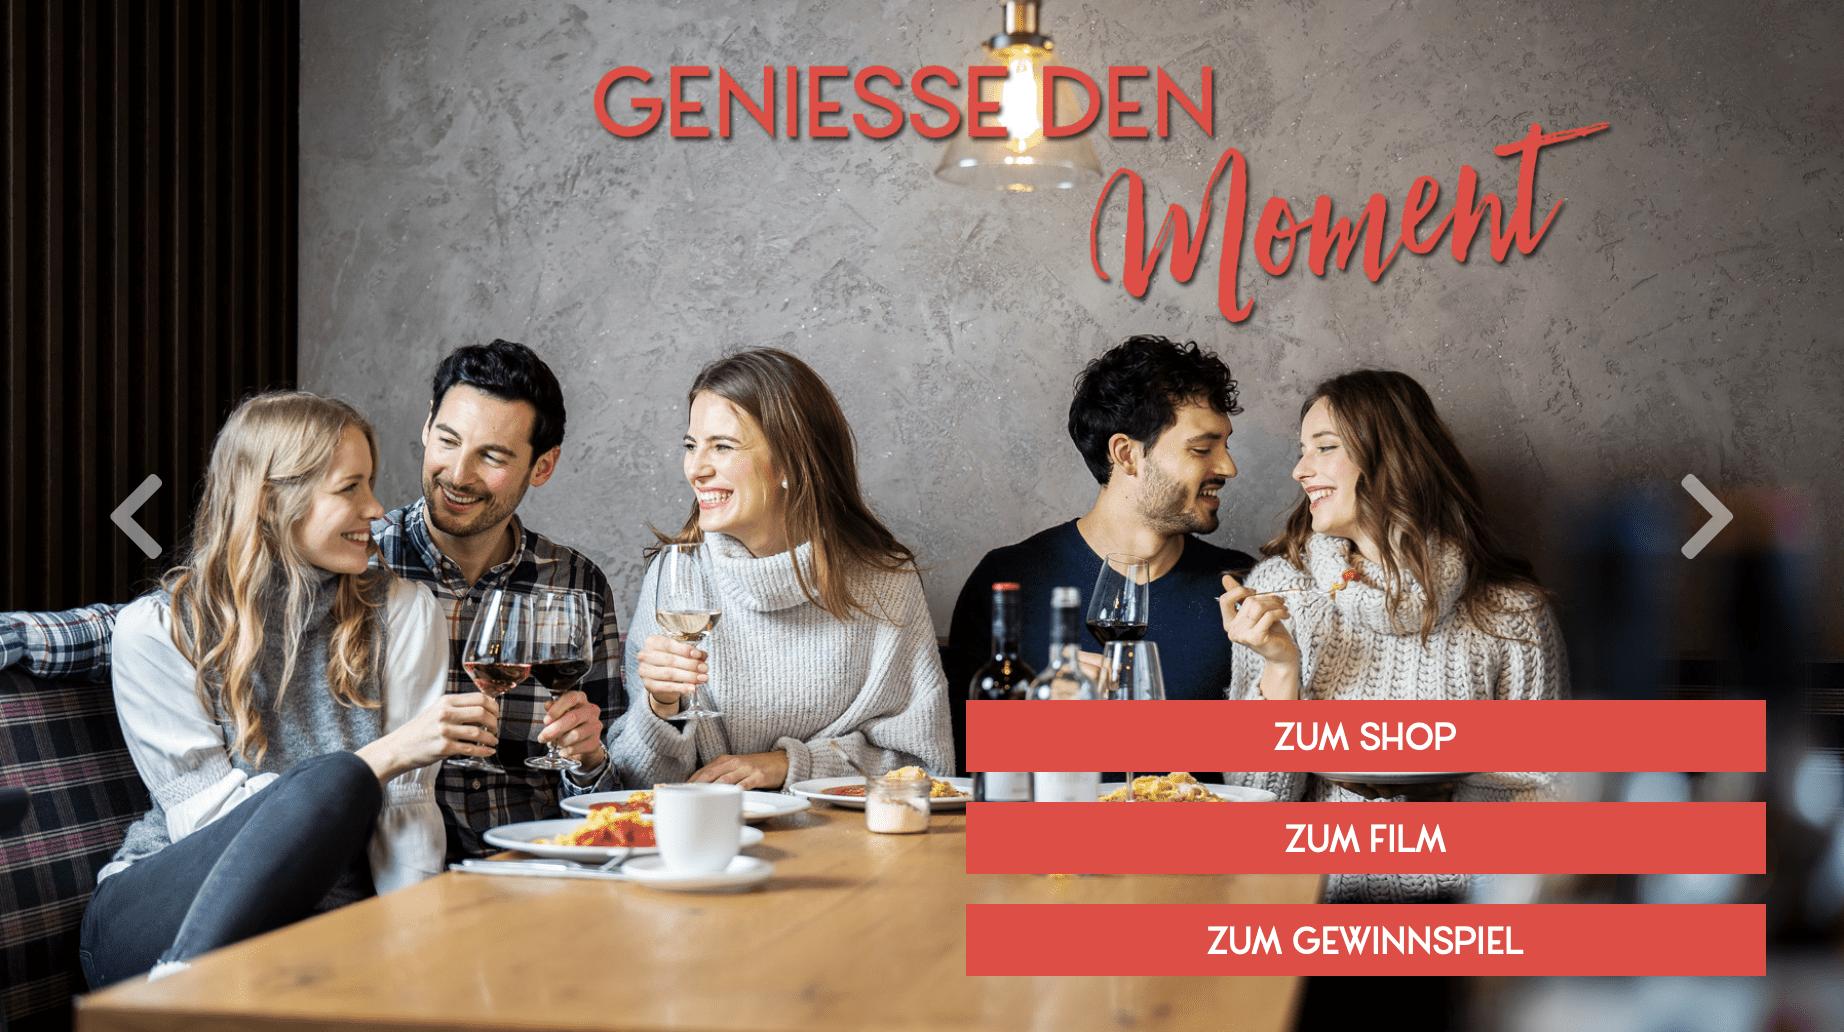 Gewinnspiel-Cases FMCG Getränke Oberkircher Winzer